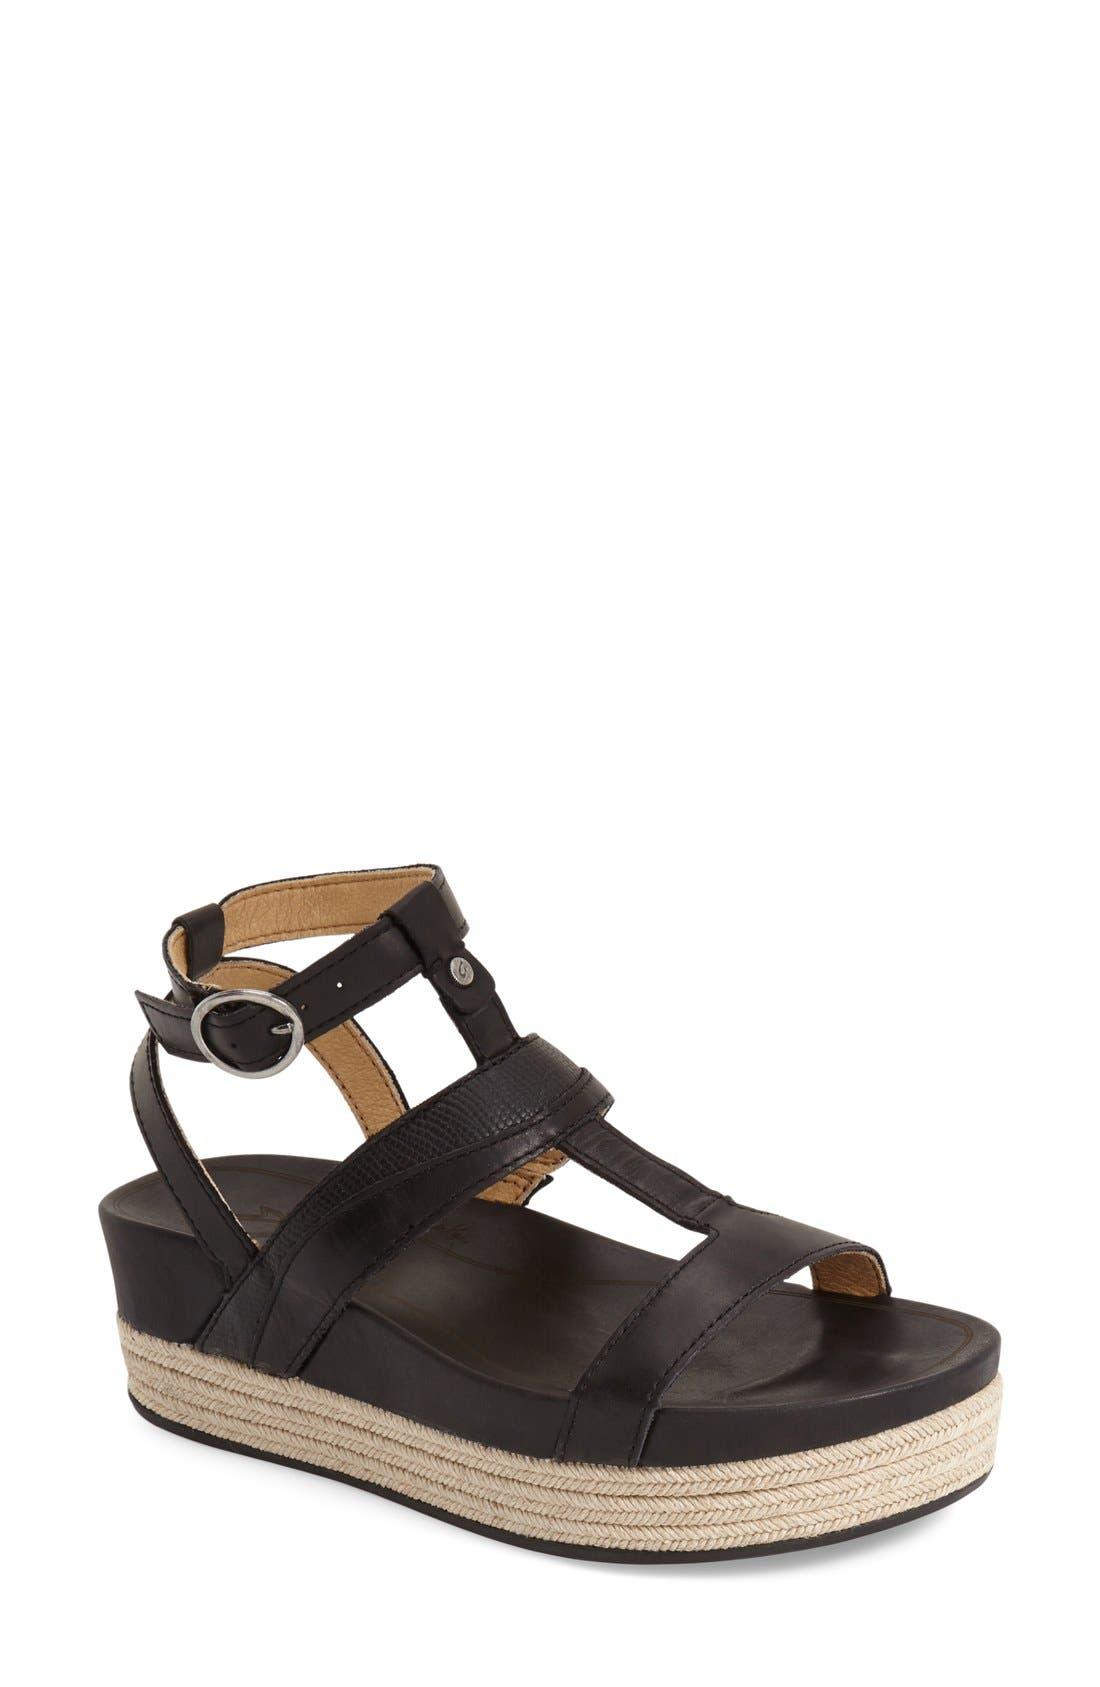 Alternate Image 1 Selected - OluKai 'Hi Ona Loa' Espadrille Platform Sandal (Women)